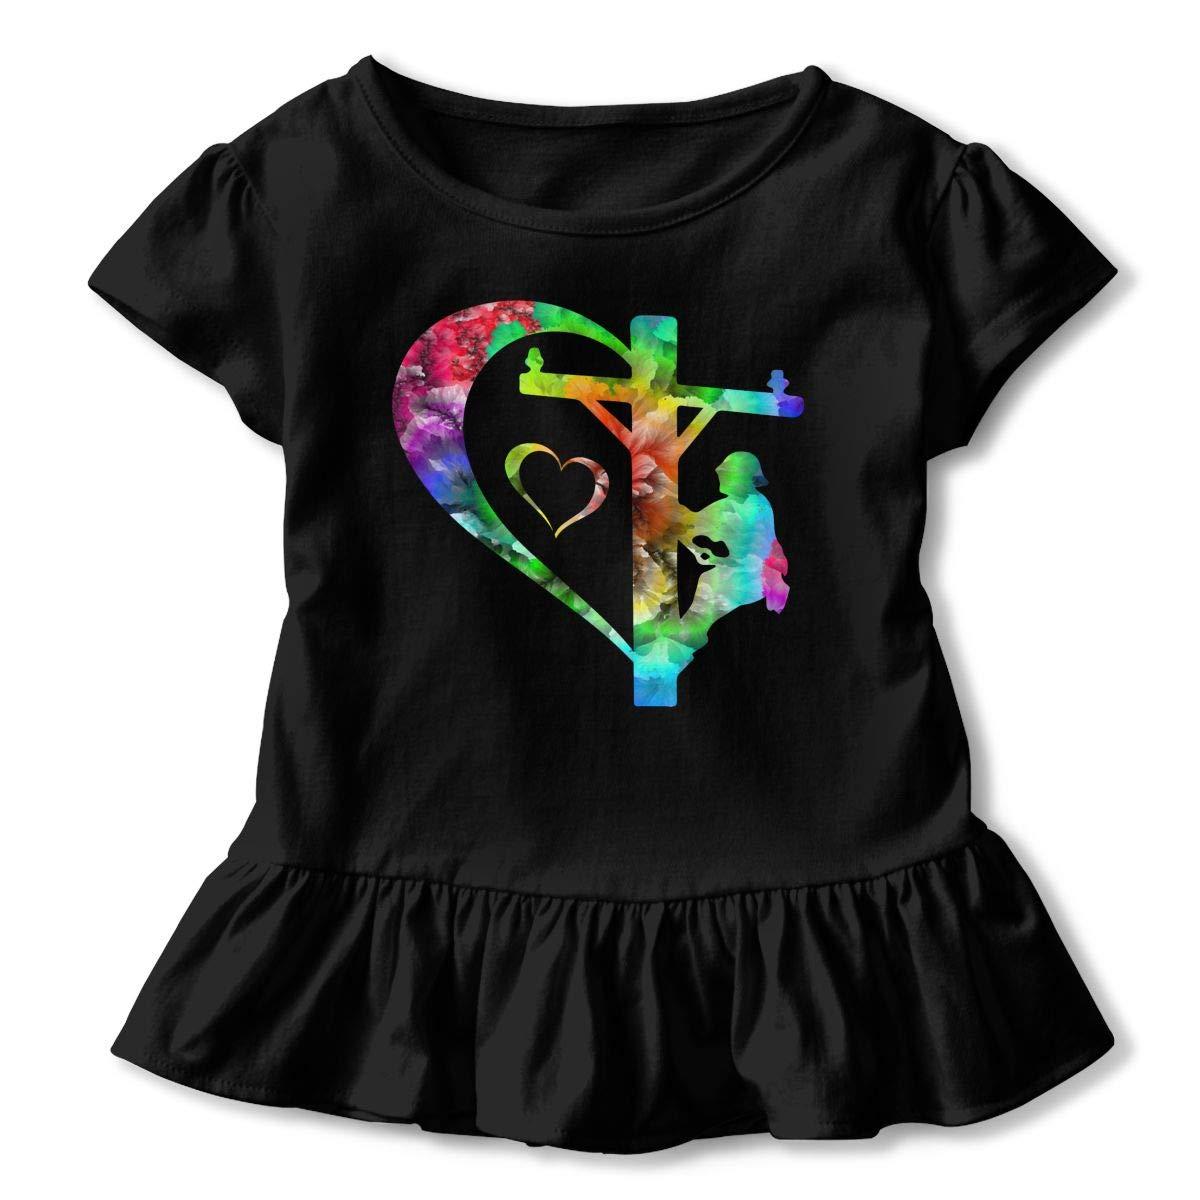 Lineman On A Pole Statue Heart Toddler Baby Girls Short Sleeve Ruffle T-Shirt